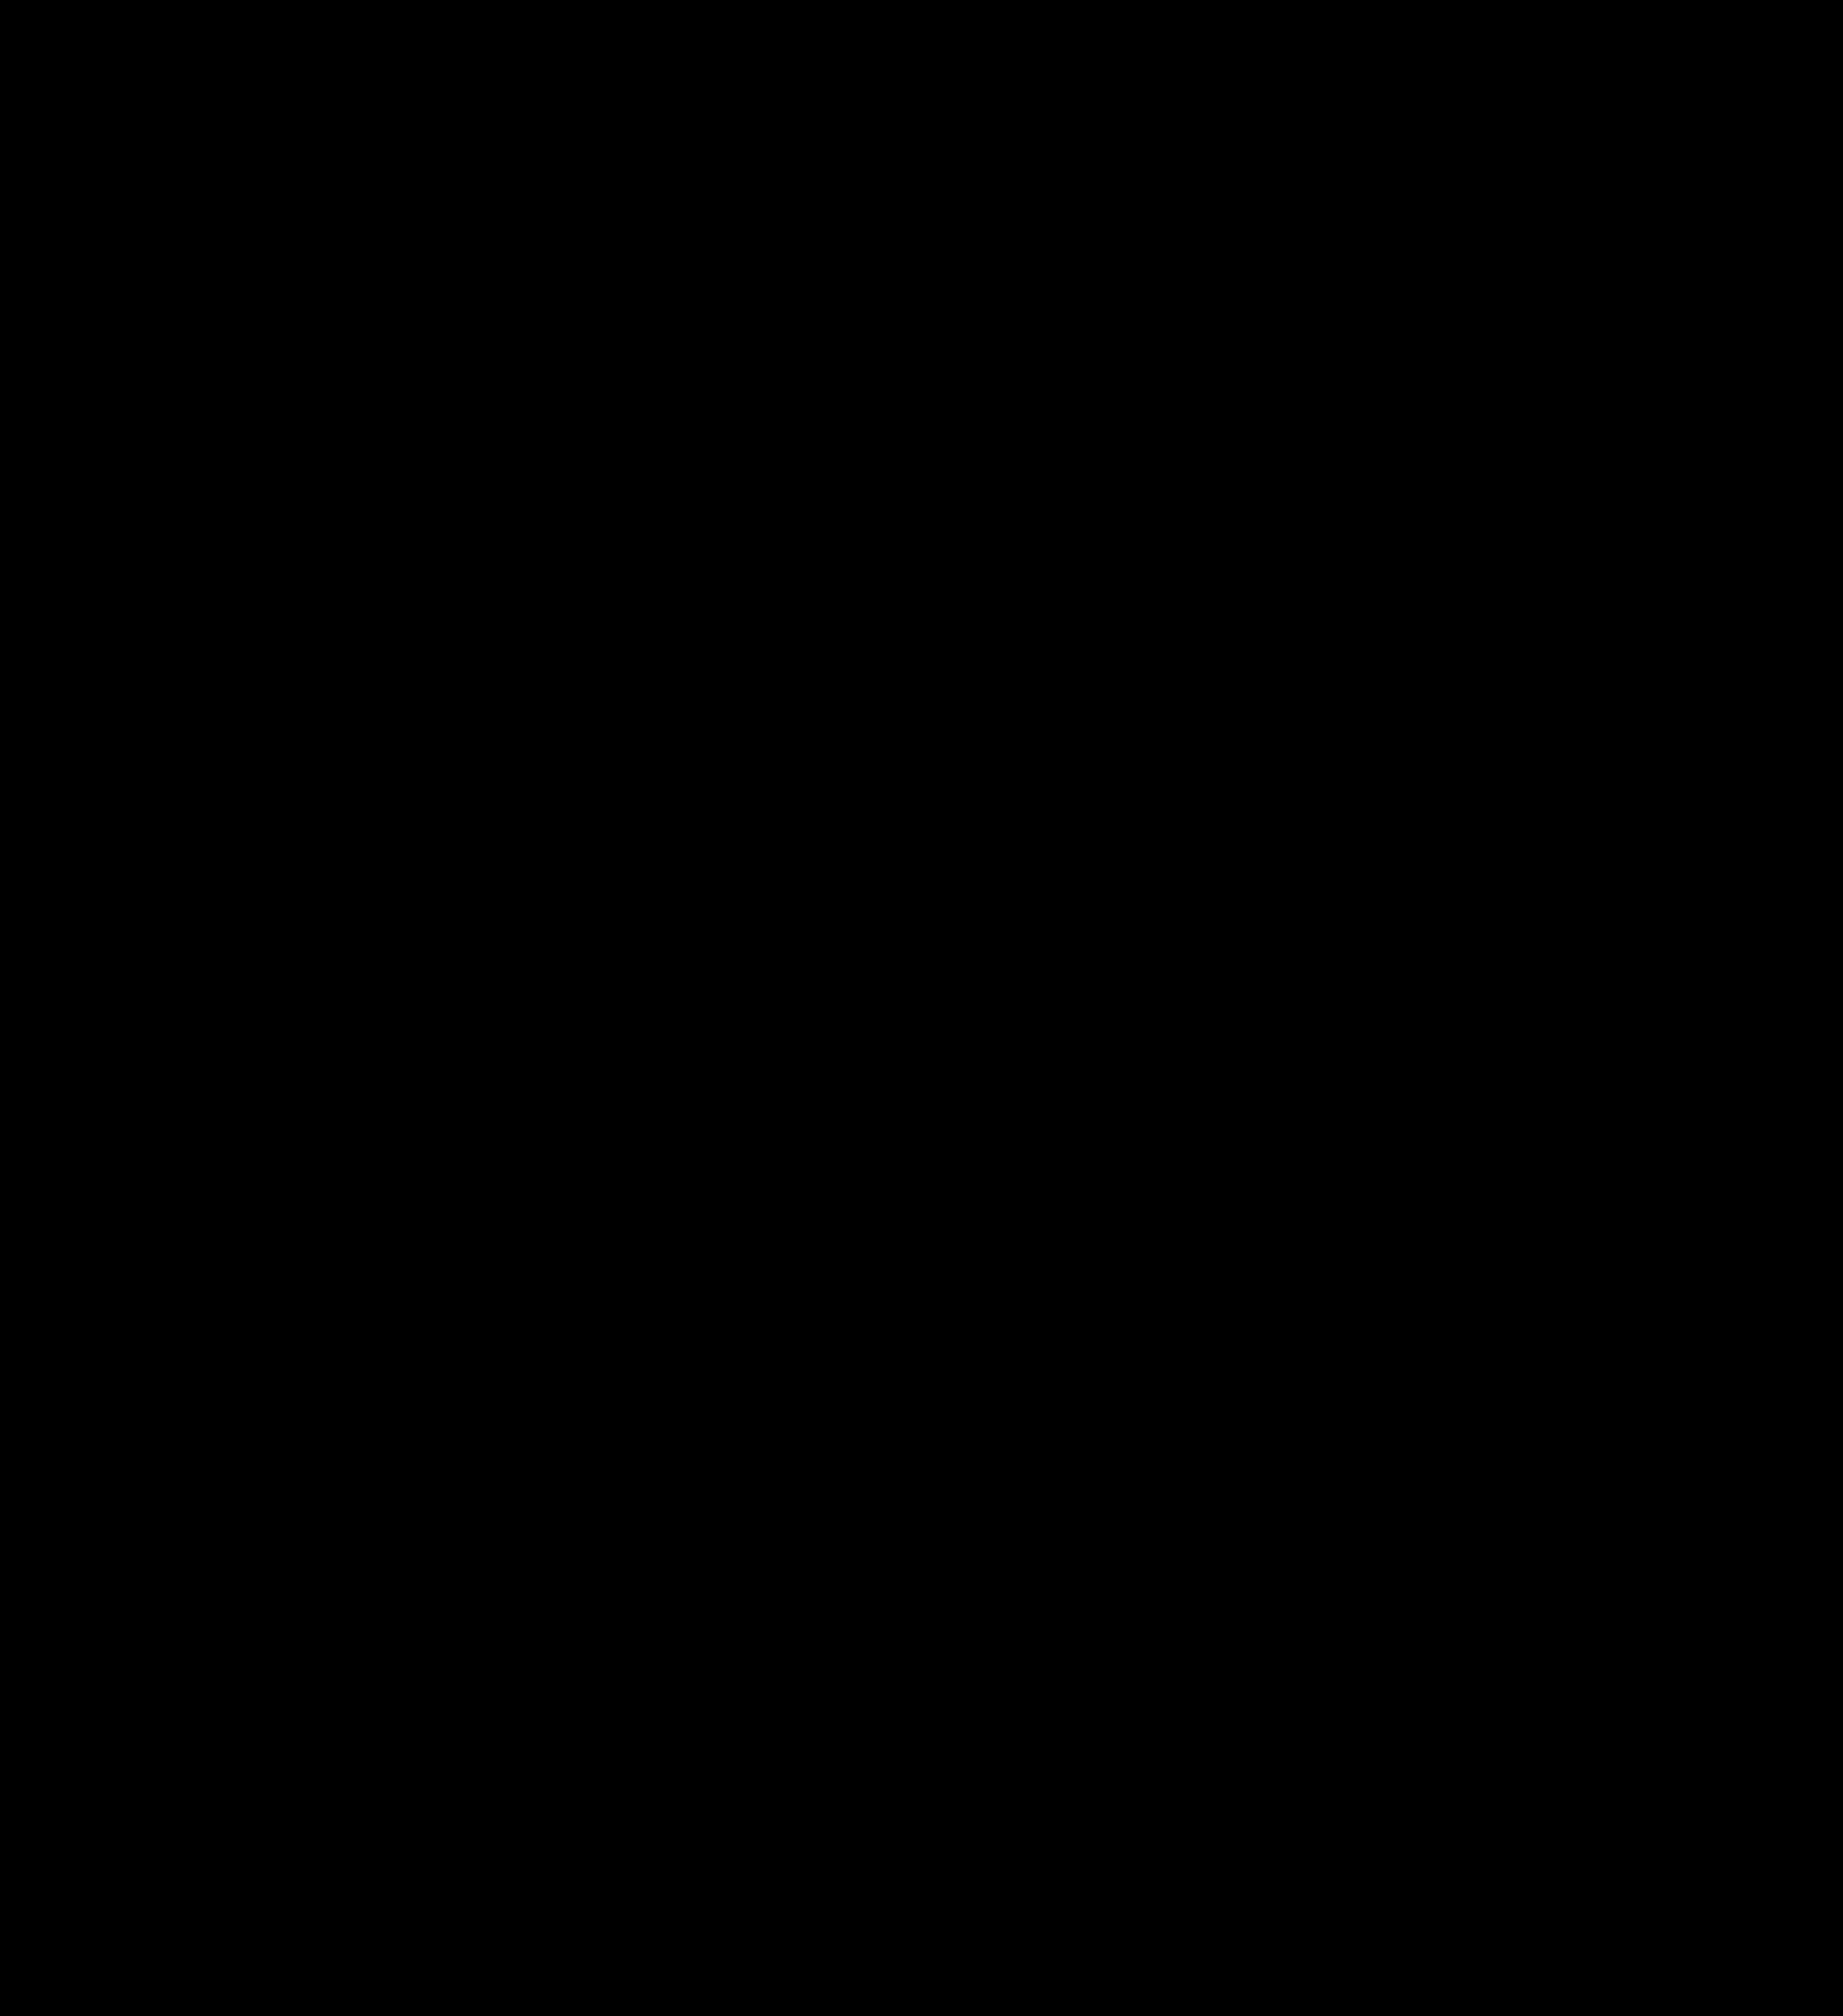 BIG IMAGE (PNG) - Yoga HD PNG